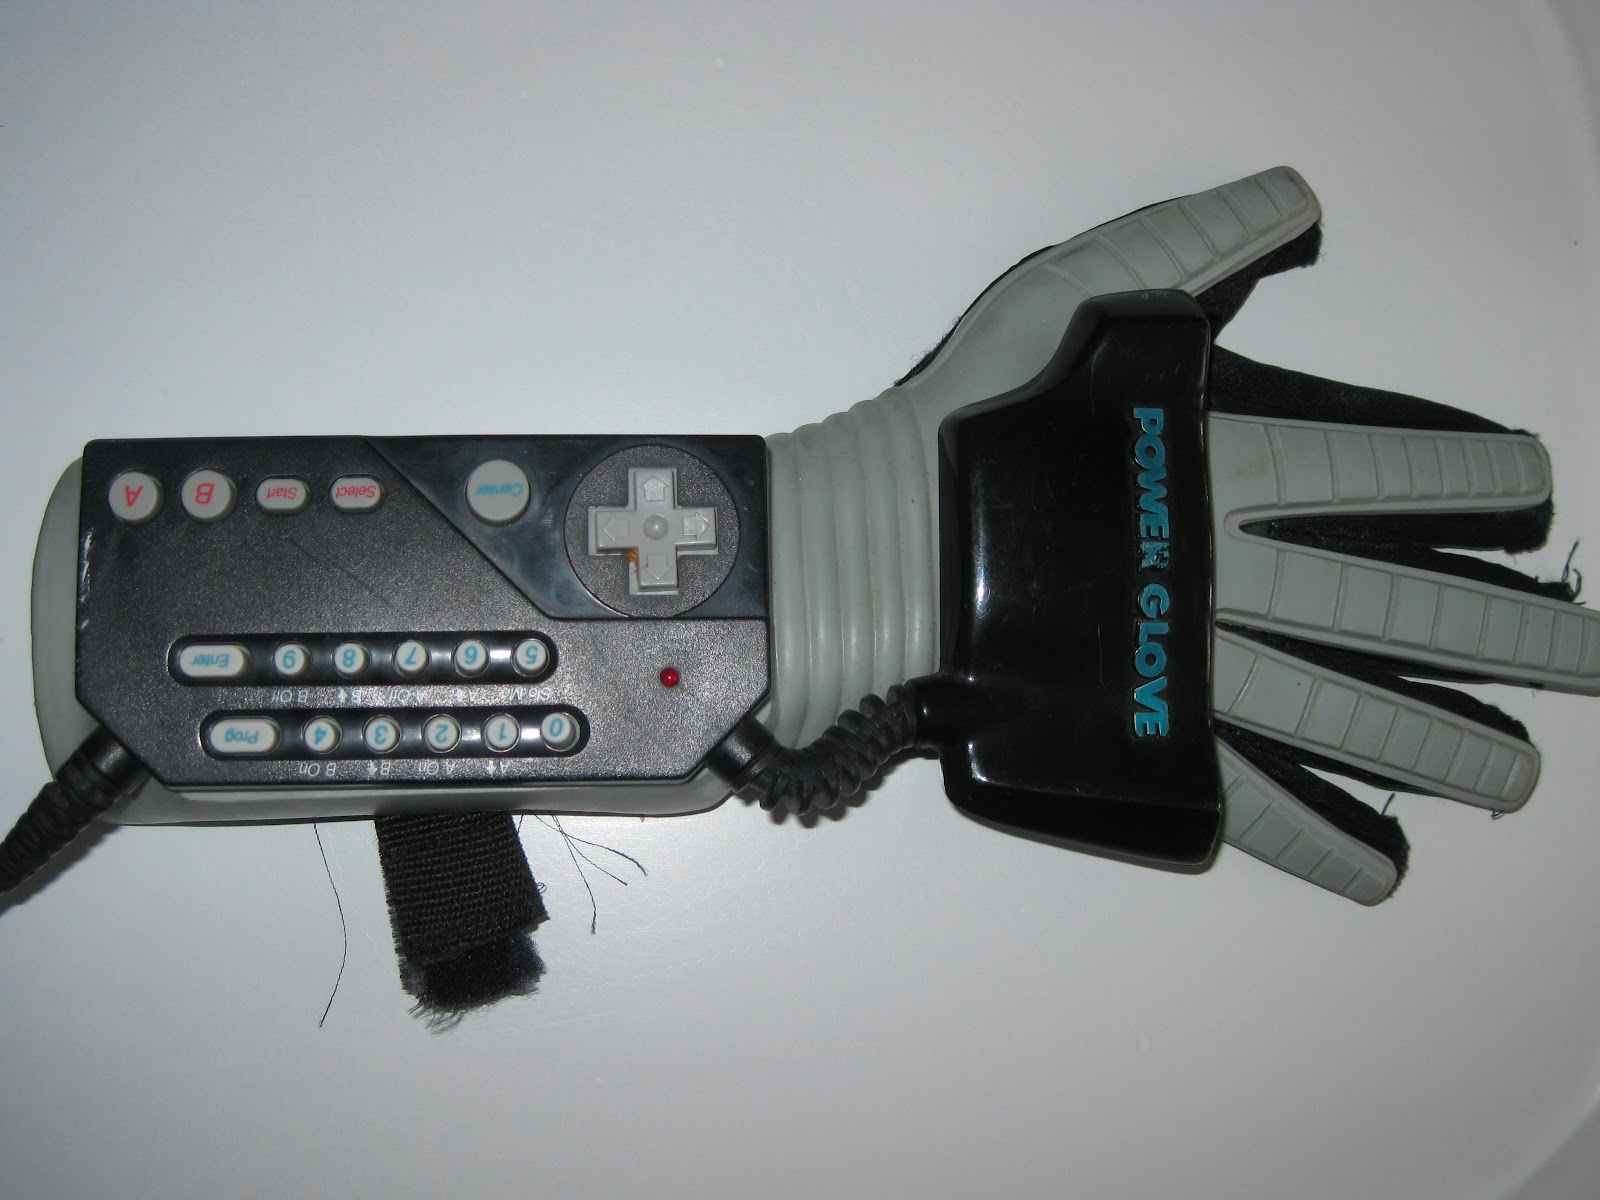 Robot Chicken Animator Hacks a Nintendo Power Glove